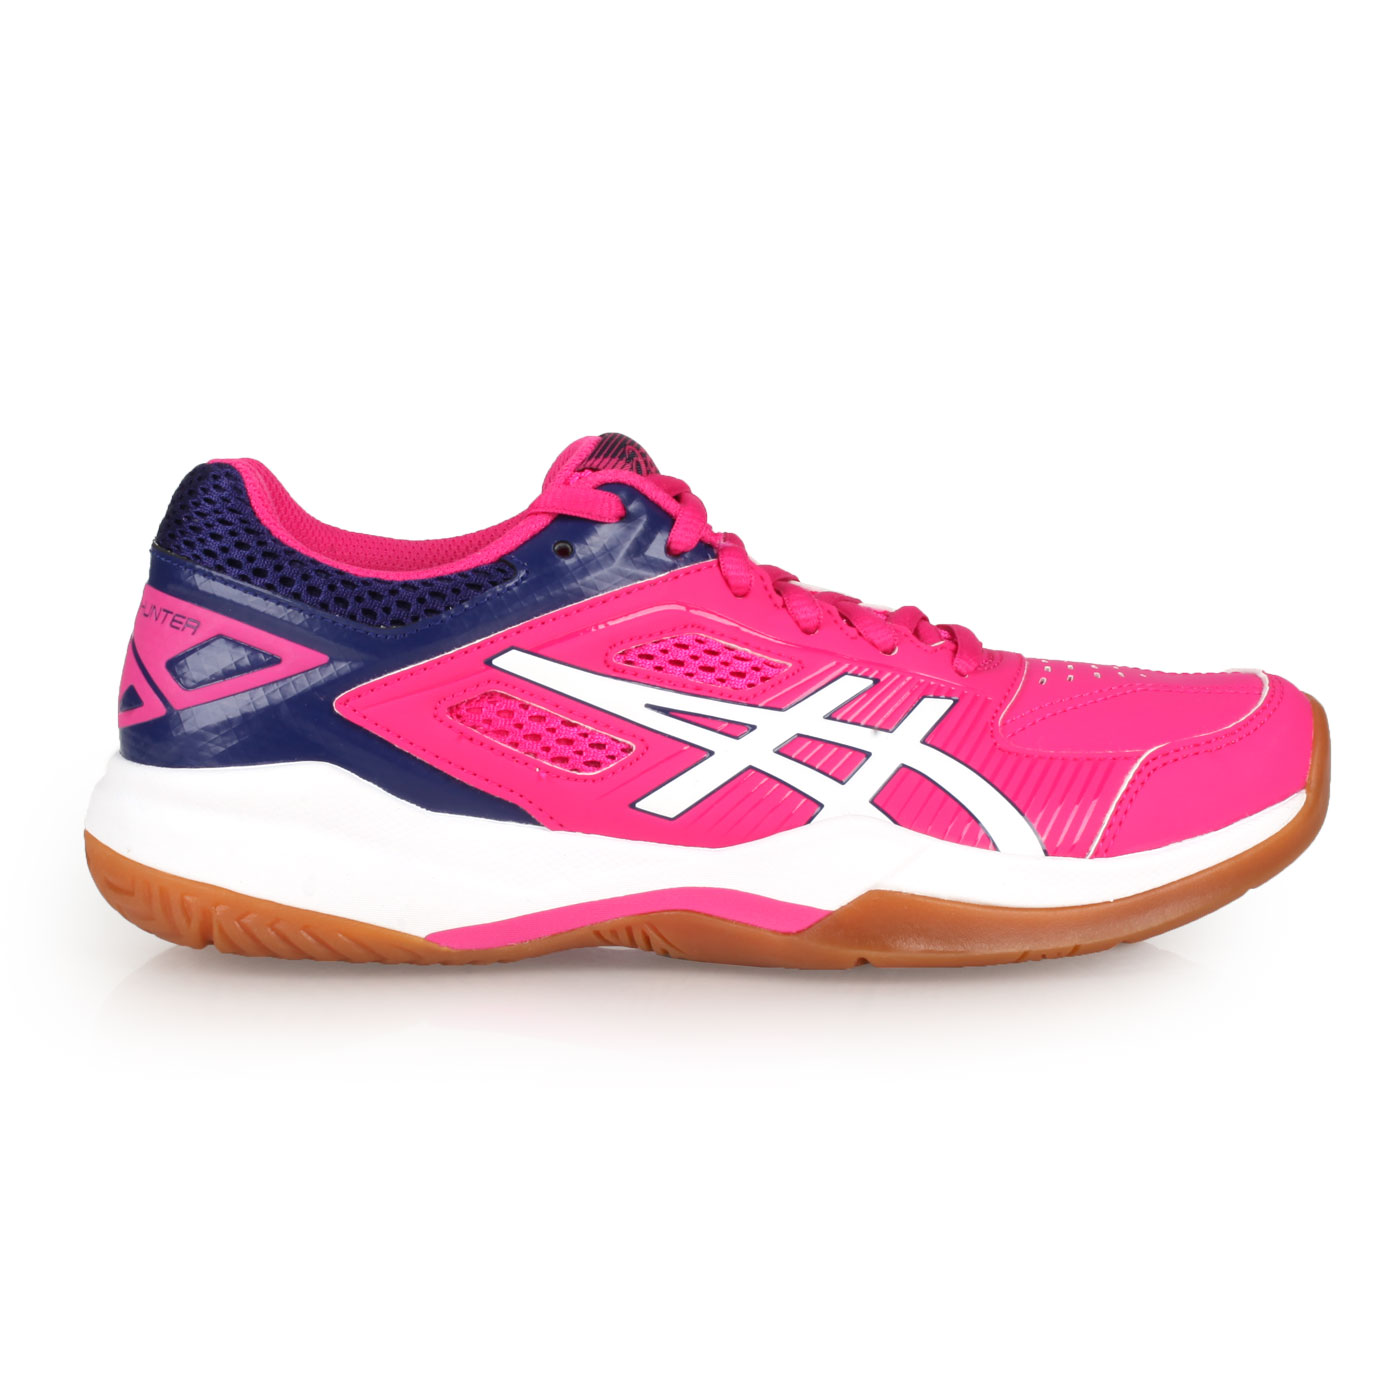 ASICS 女款羽球鞋-2E  @GEL-COURT HUNTER@1072A015-118 - 桃紅丈青白